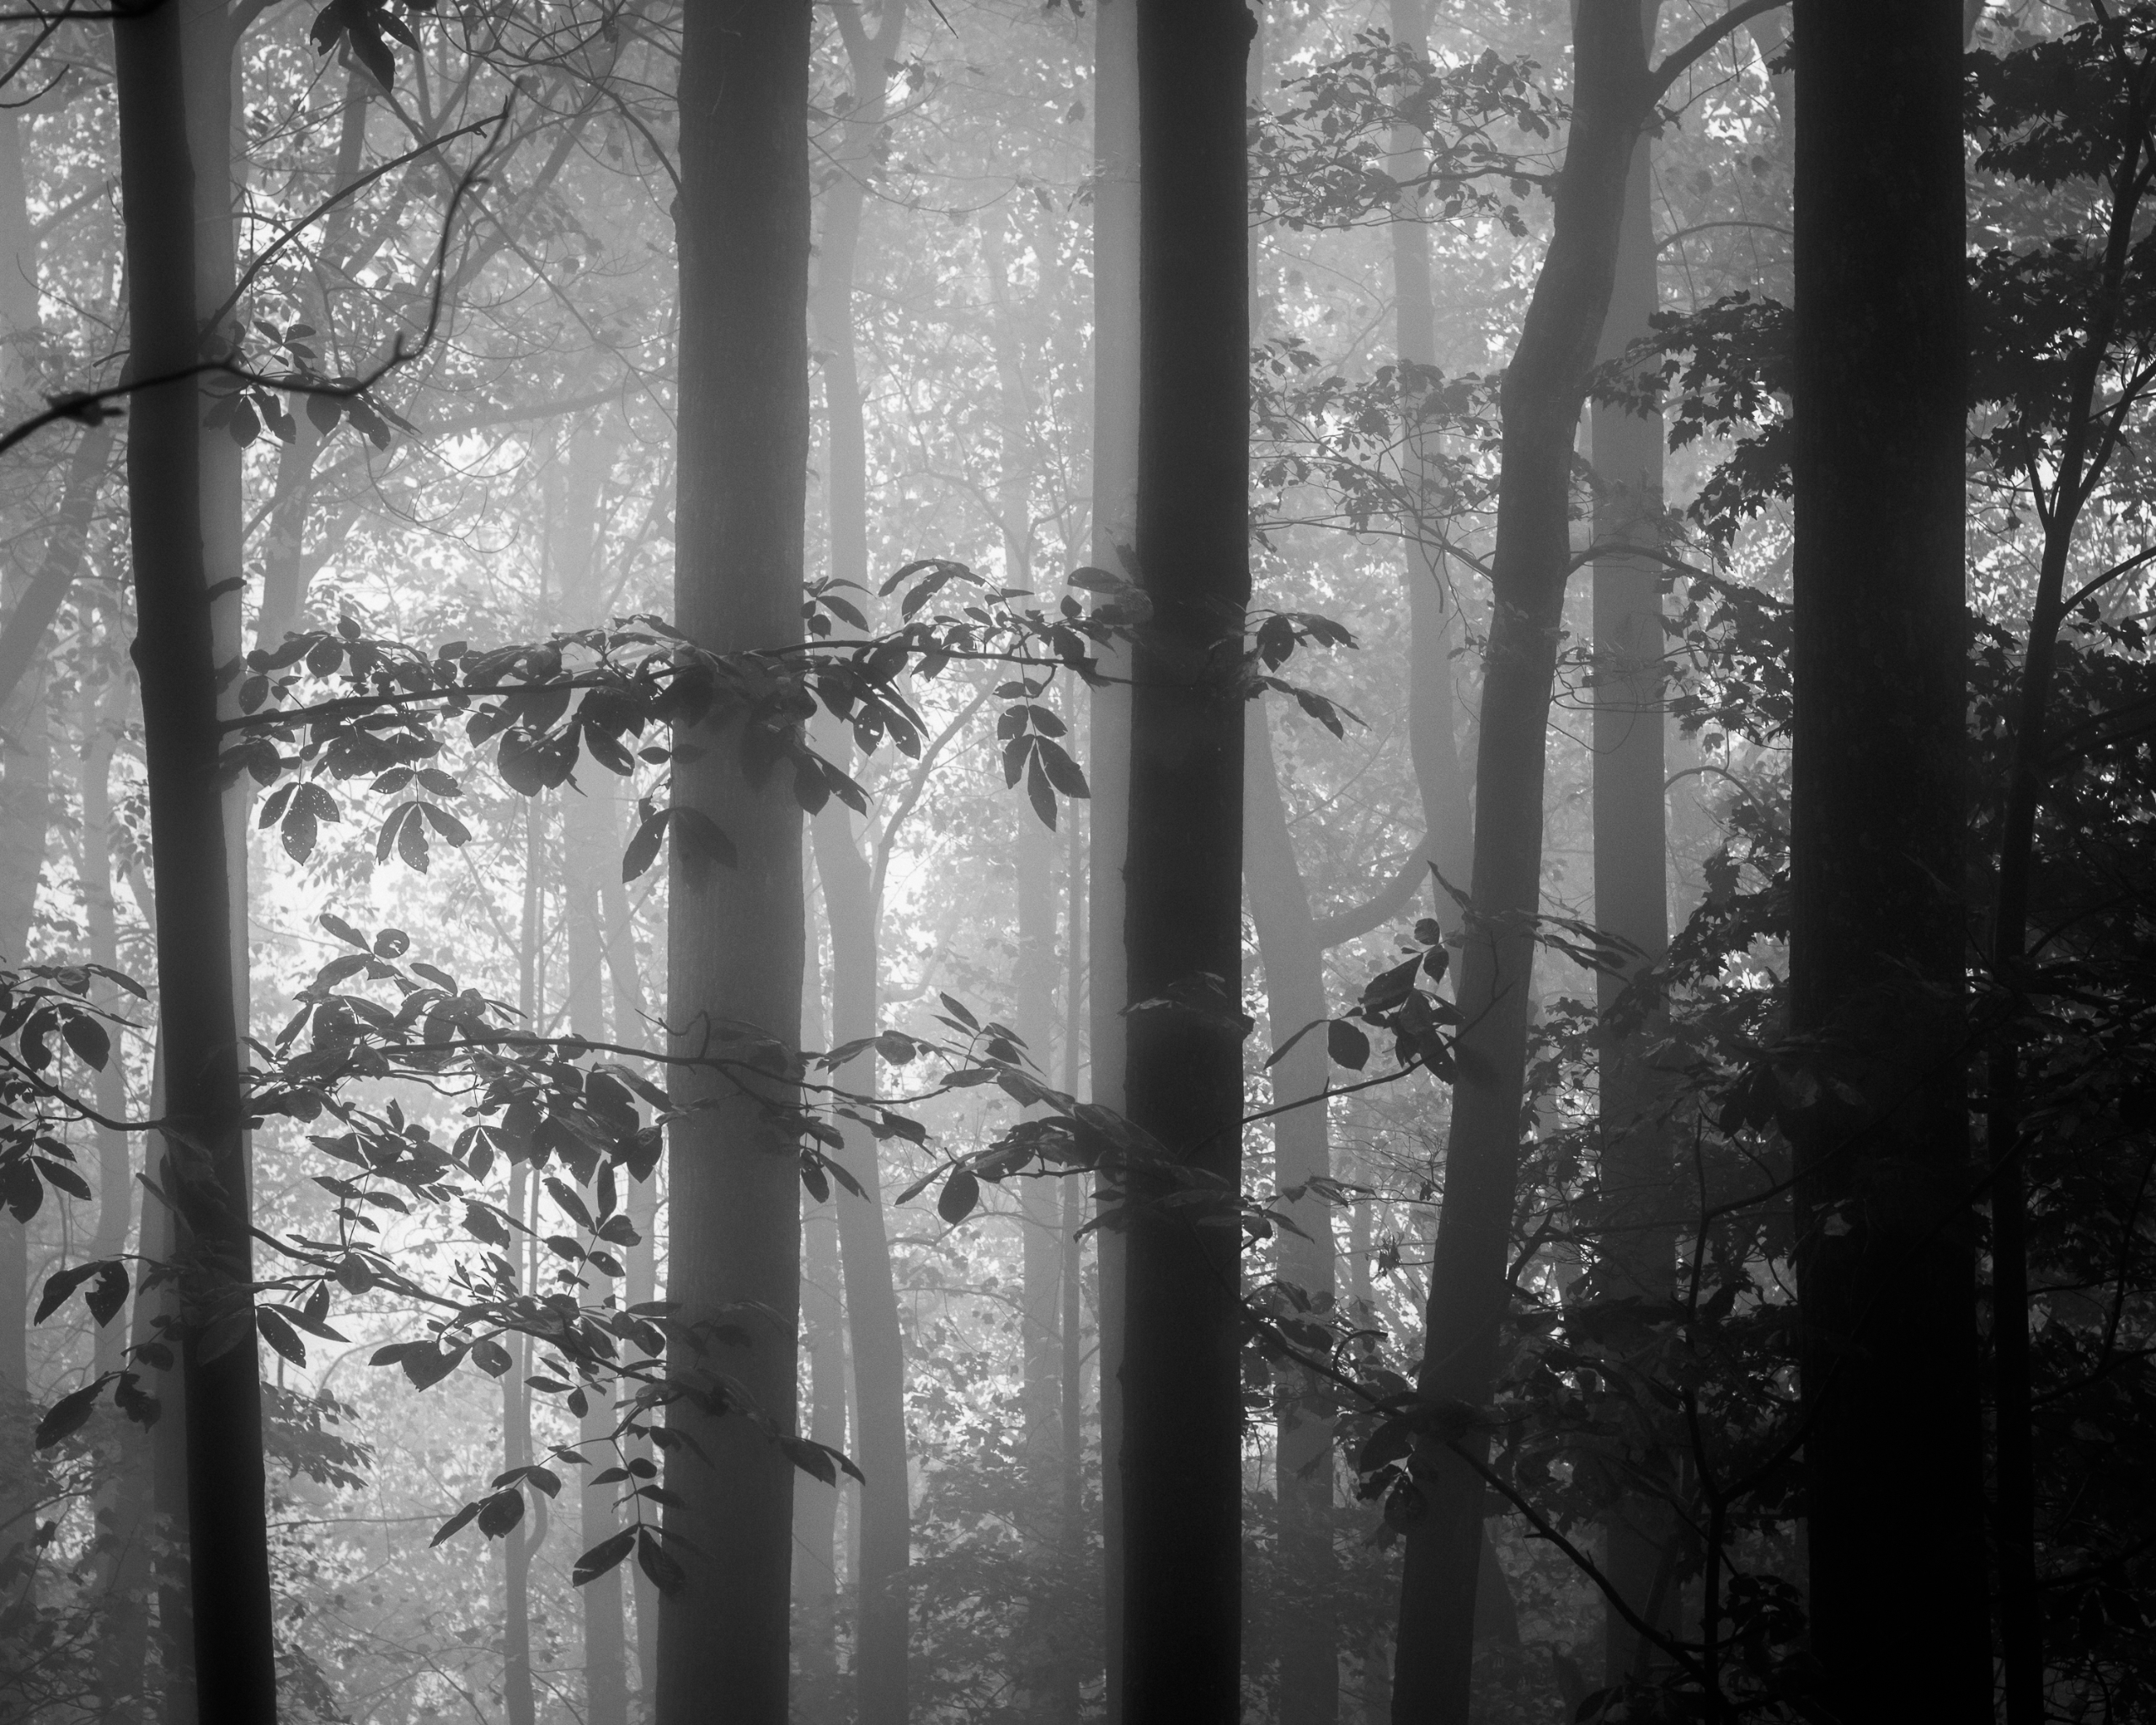 Walking Mountain Rainy Day Flin - jdharvey | ello